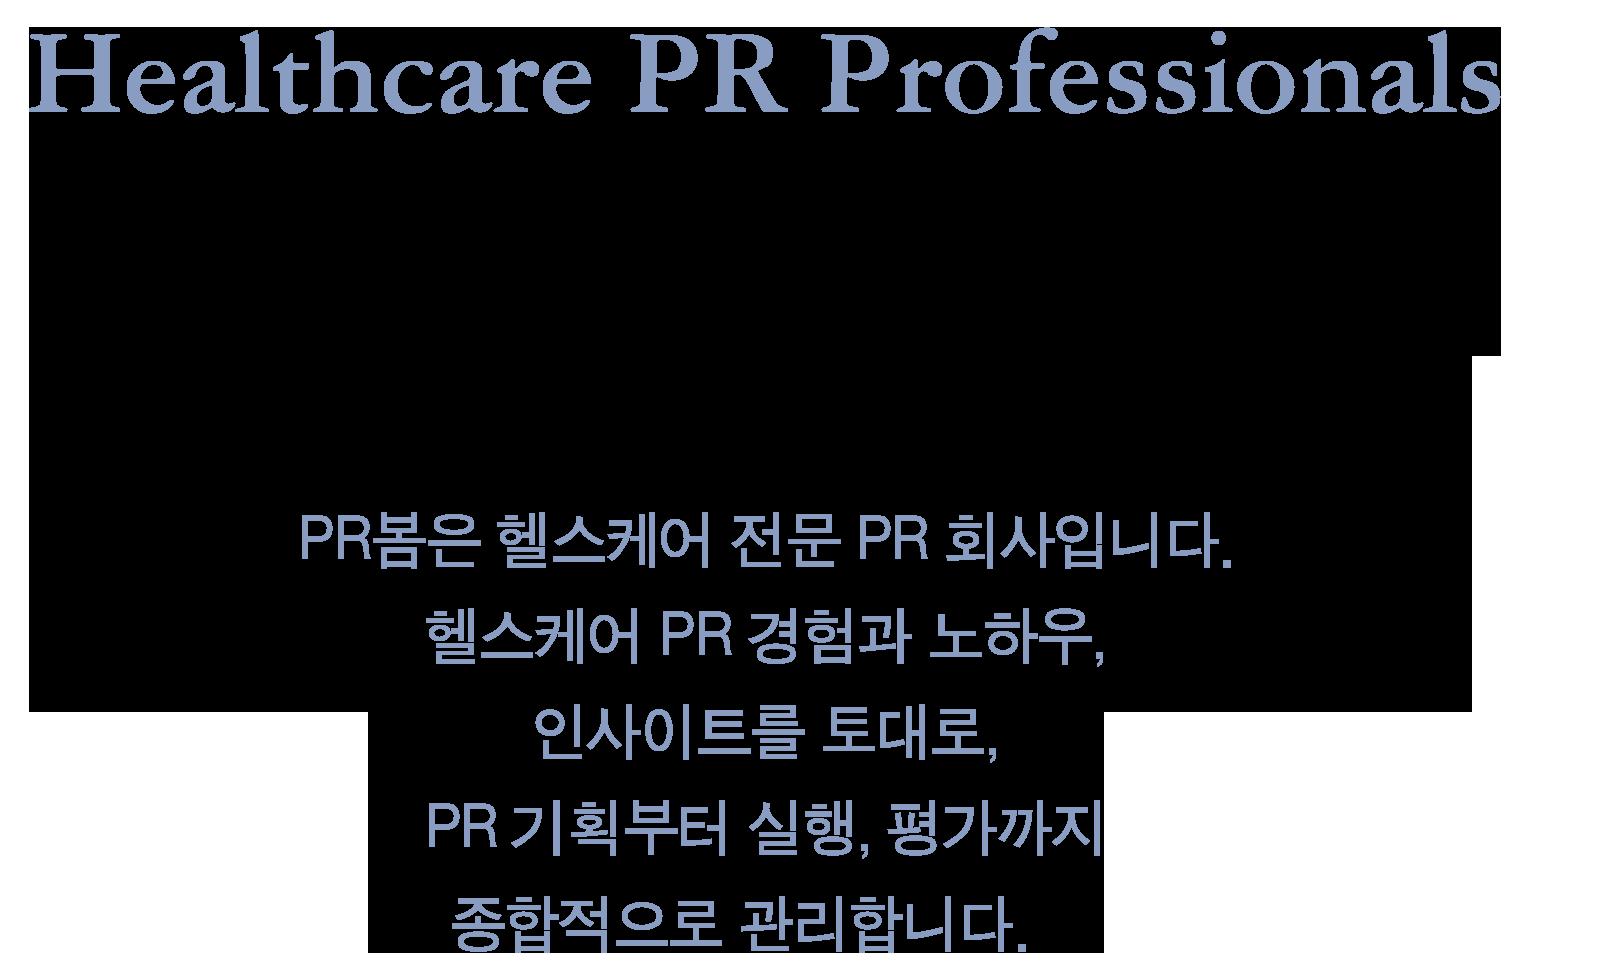 Healthcare PR Professionals PR봄은 헬스케어 전문 PR 회사입니다. 헬스케어 PR 경험과 노하우, 인사이트를 토대로, PR 기획부터 실행, 평가까지 종합적으로 관리합니다.